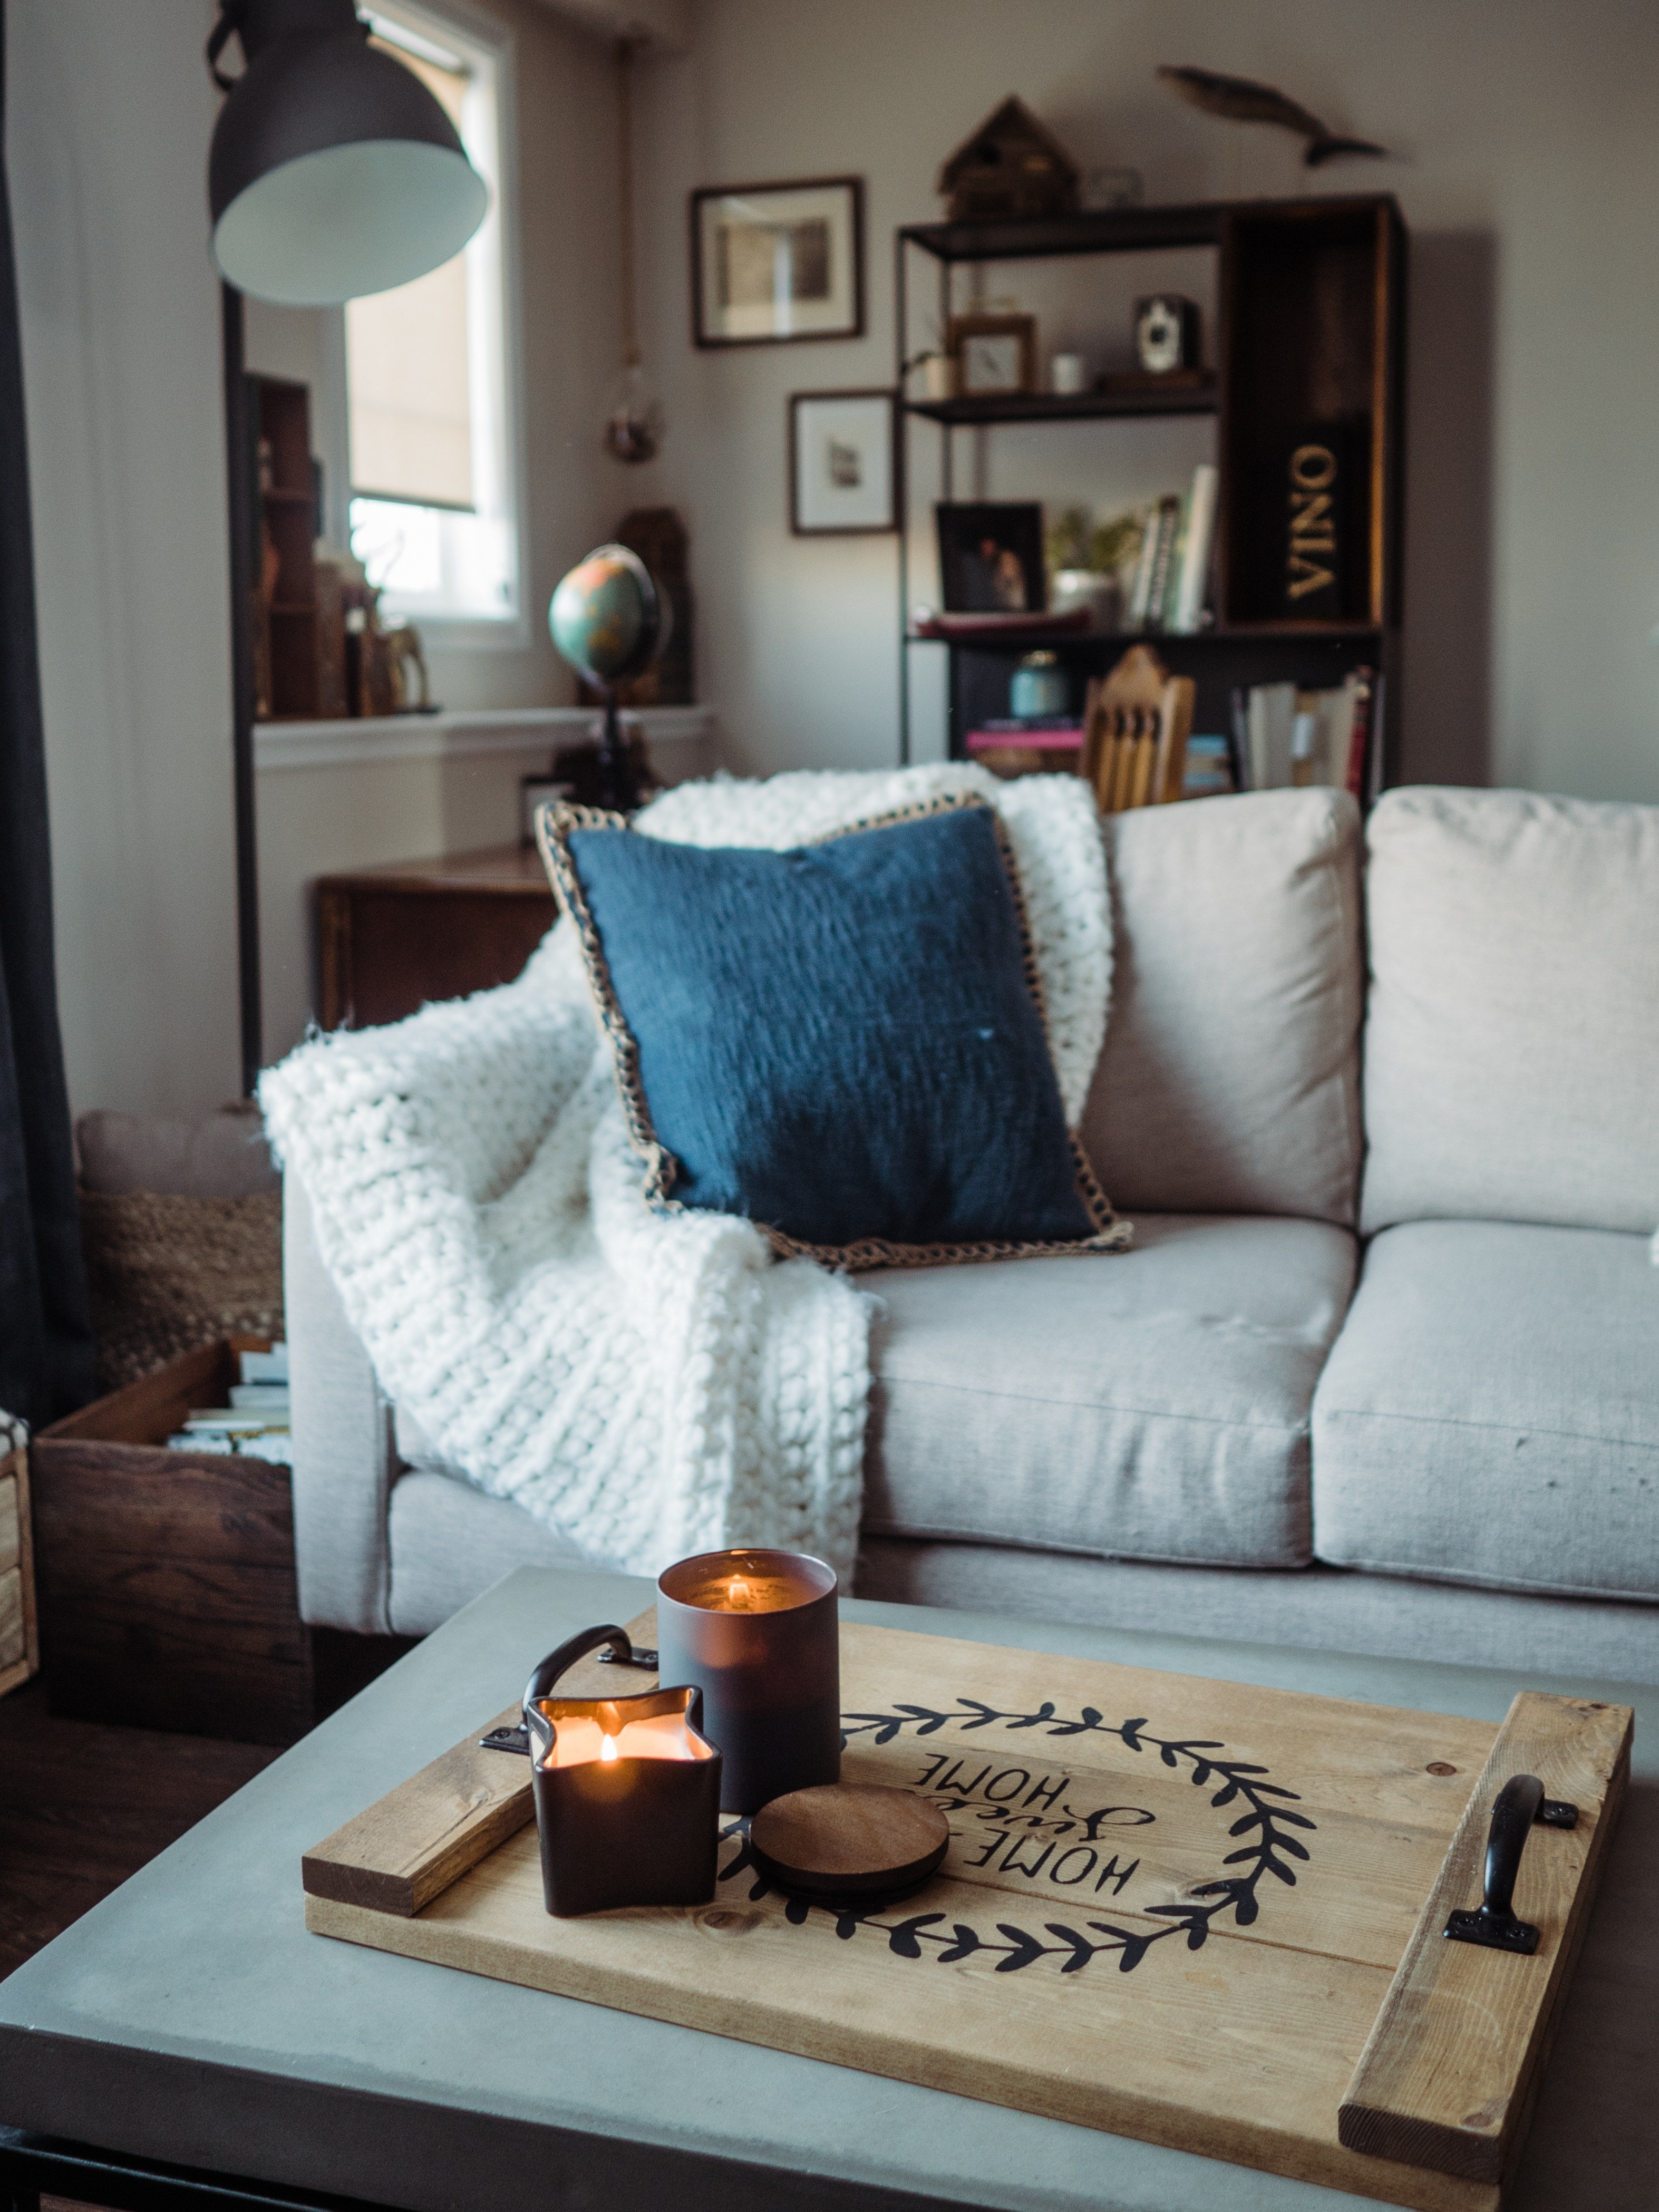 hygge the art of cozy hygge home home decor farm on hygge wall decor id=39515